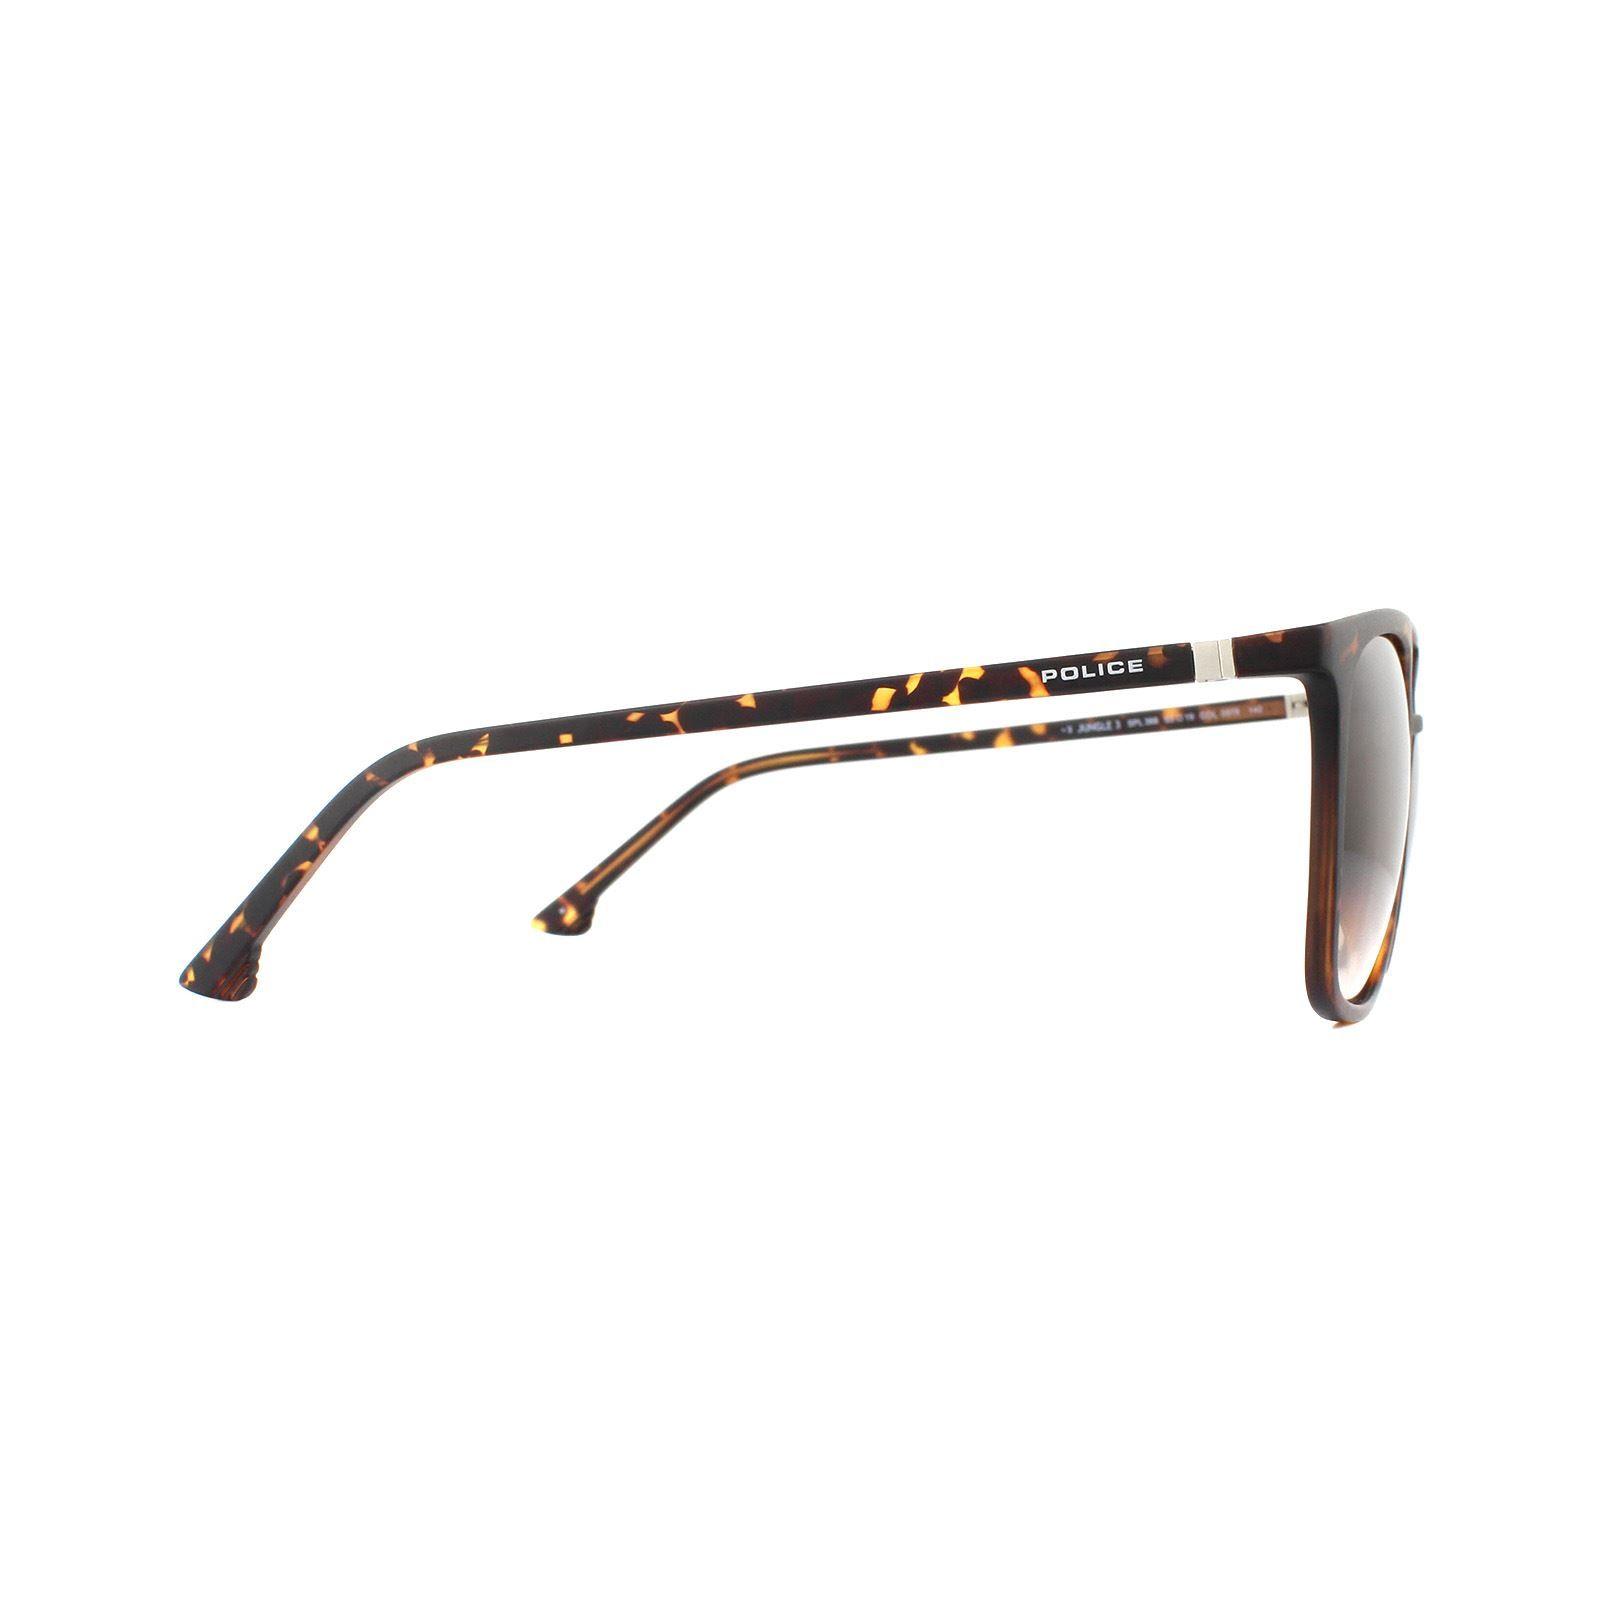 Police Sunglasses Jungle 3 SPL366 0978 Shiny Dark Havana Brown Gradient